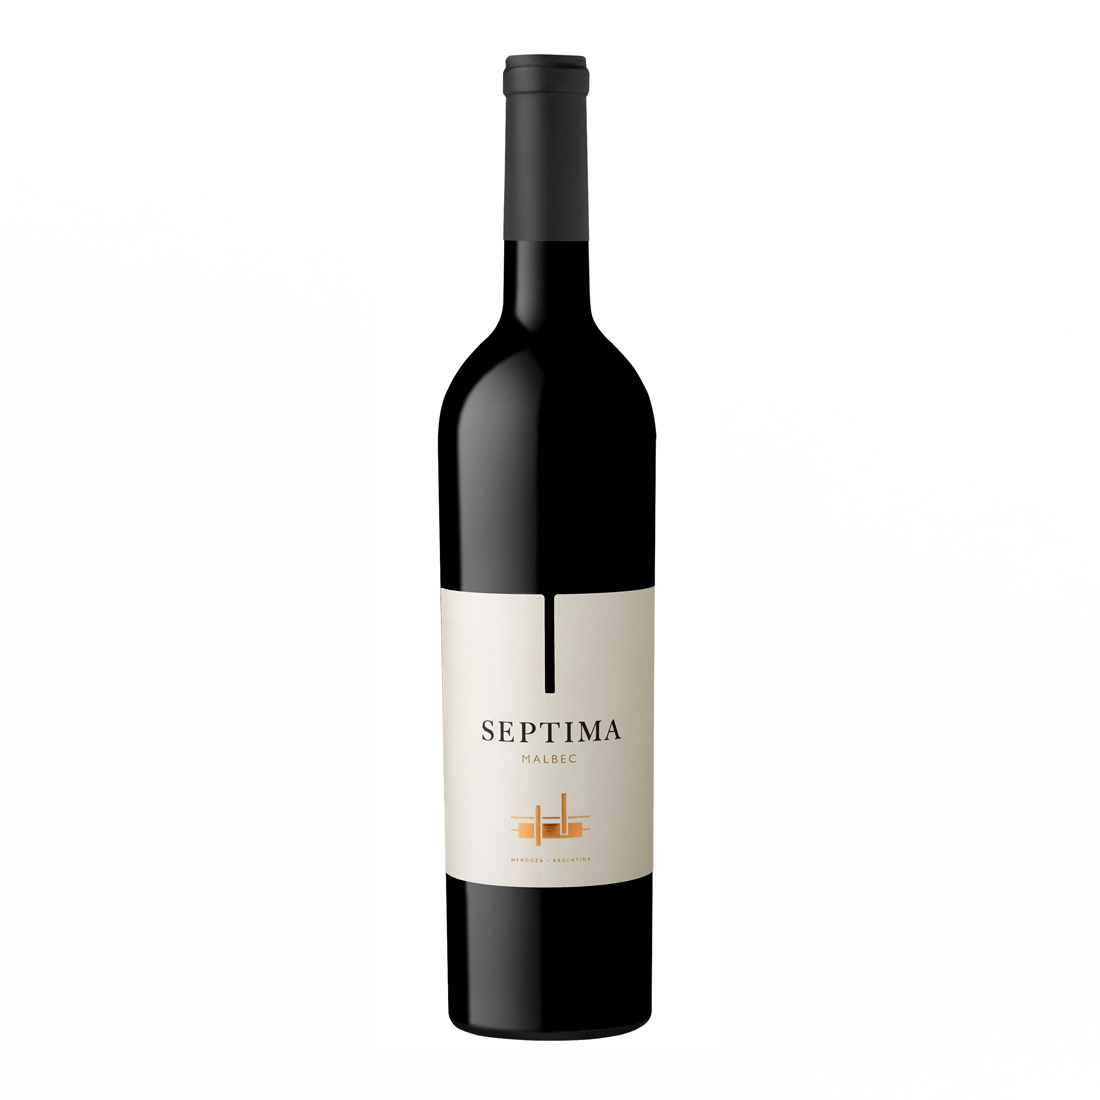 Vinho Septima Malbec 750 ml